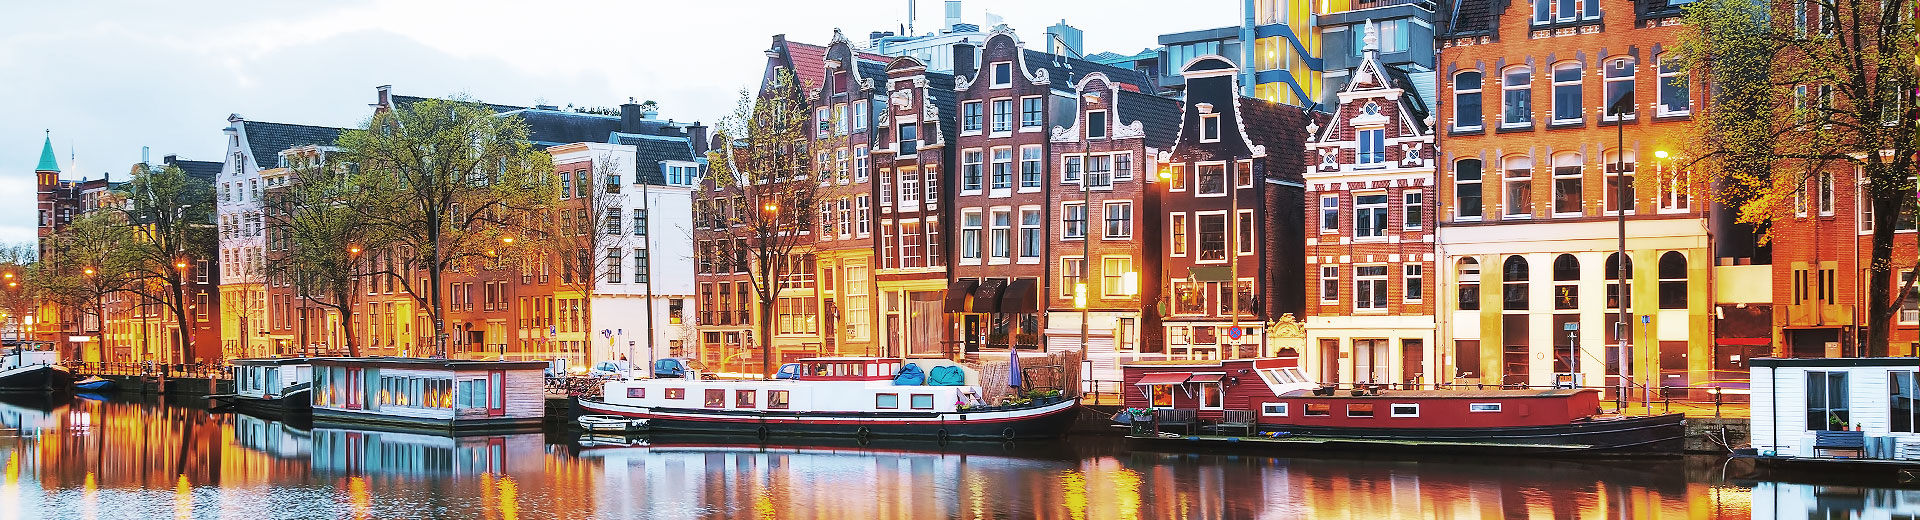 Gruppenreise Amsterdam - Package Gruppen Budget Flug